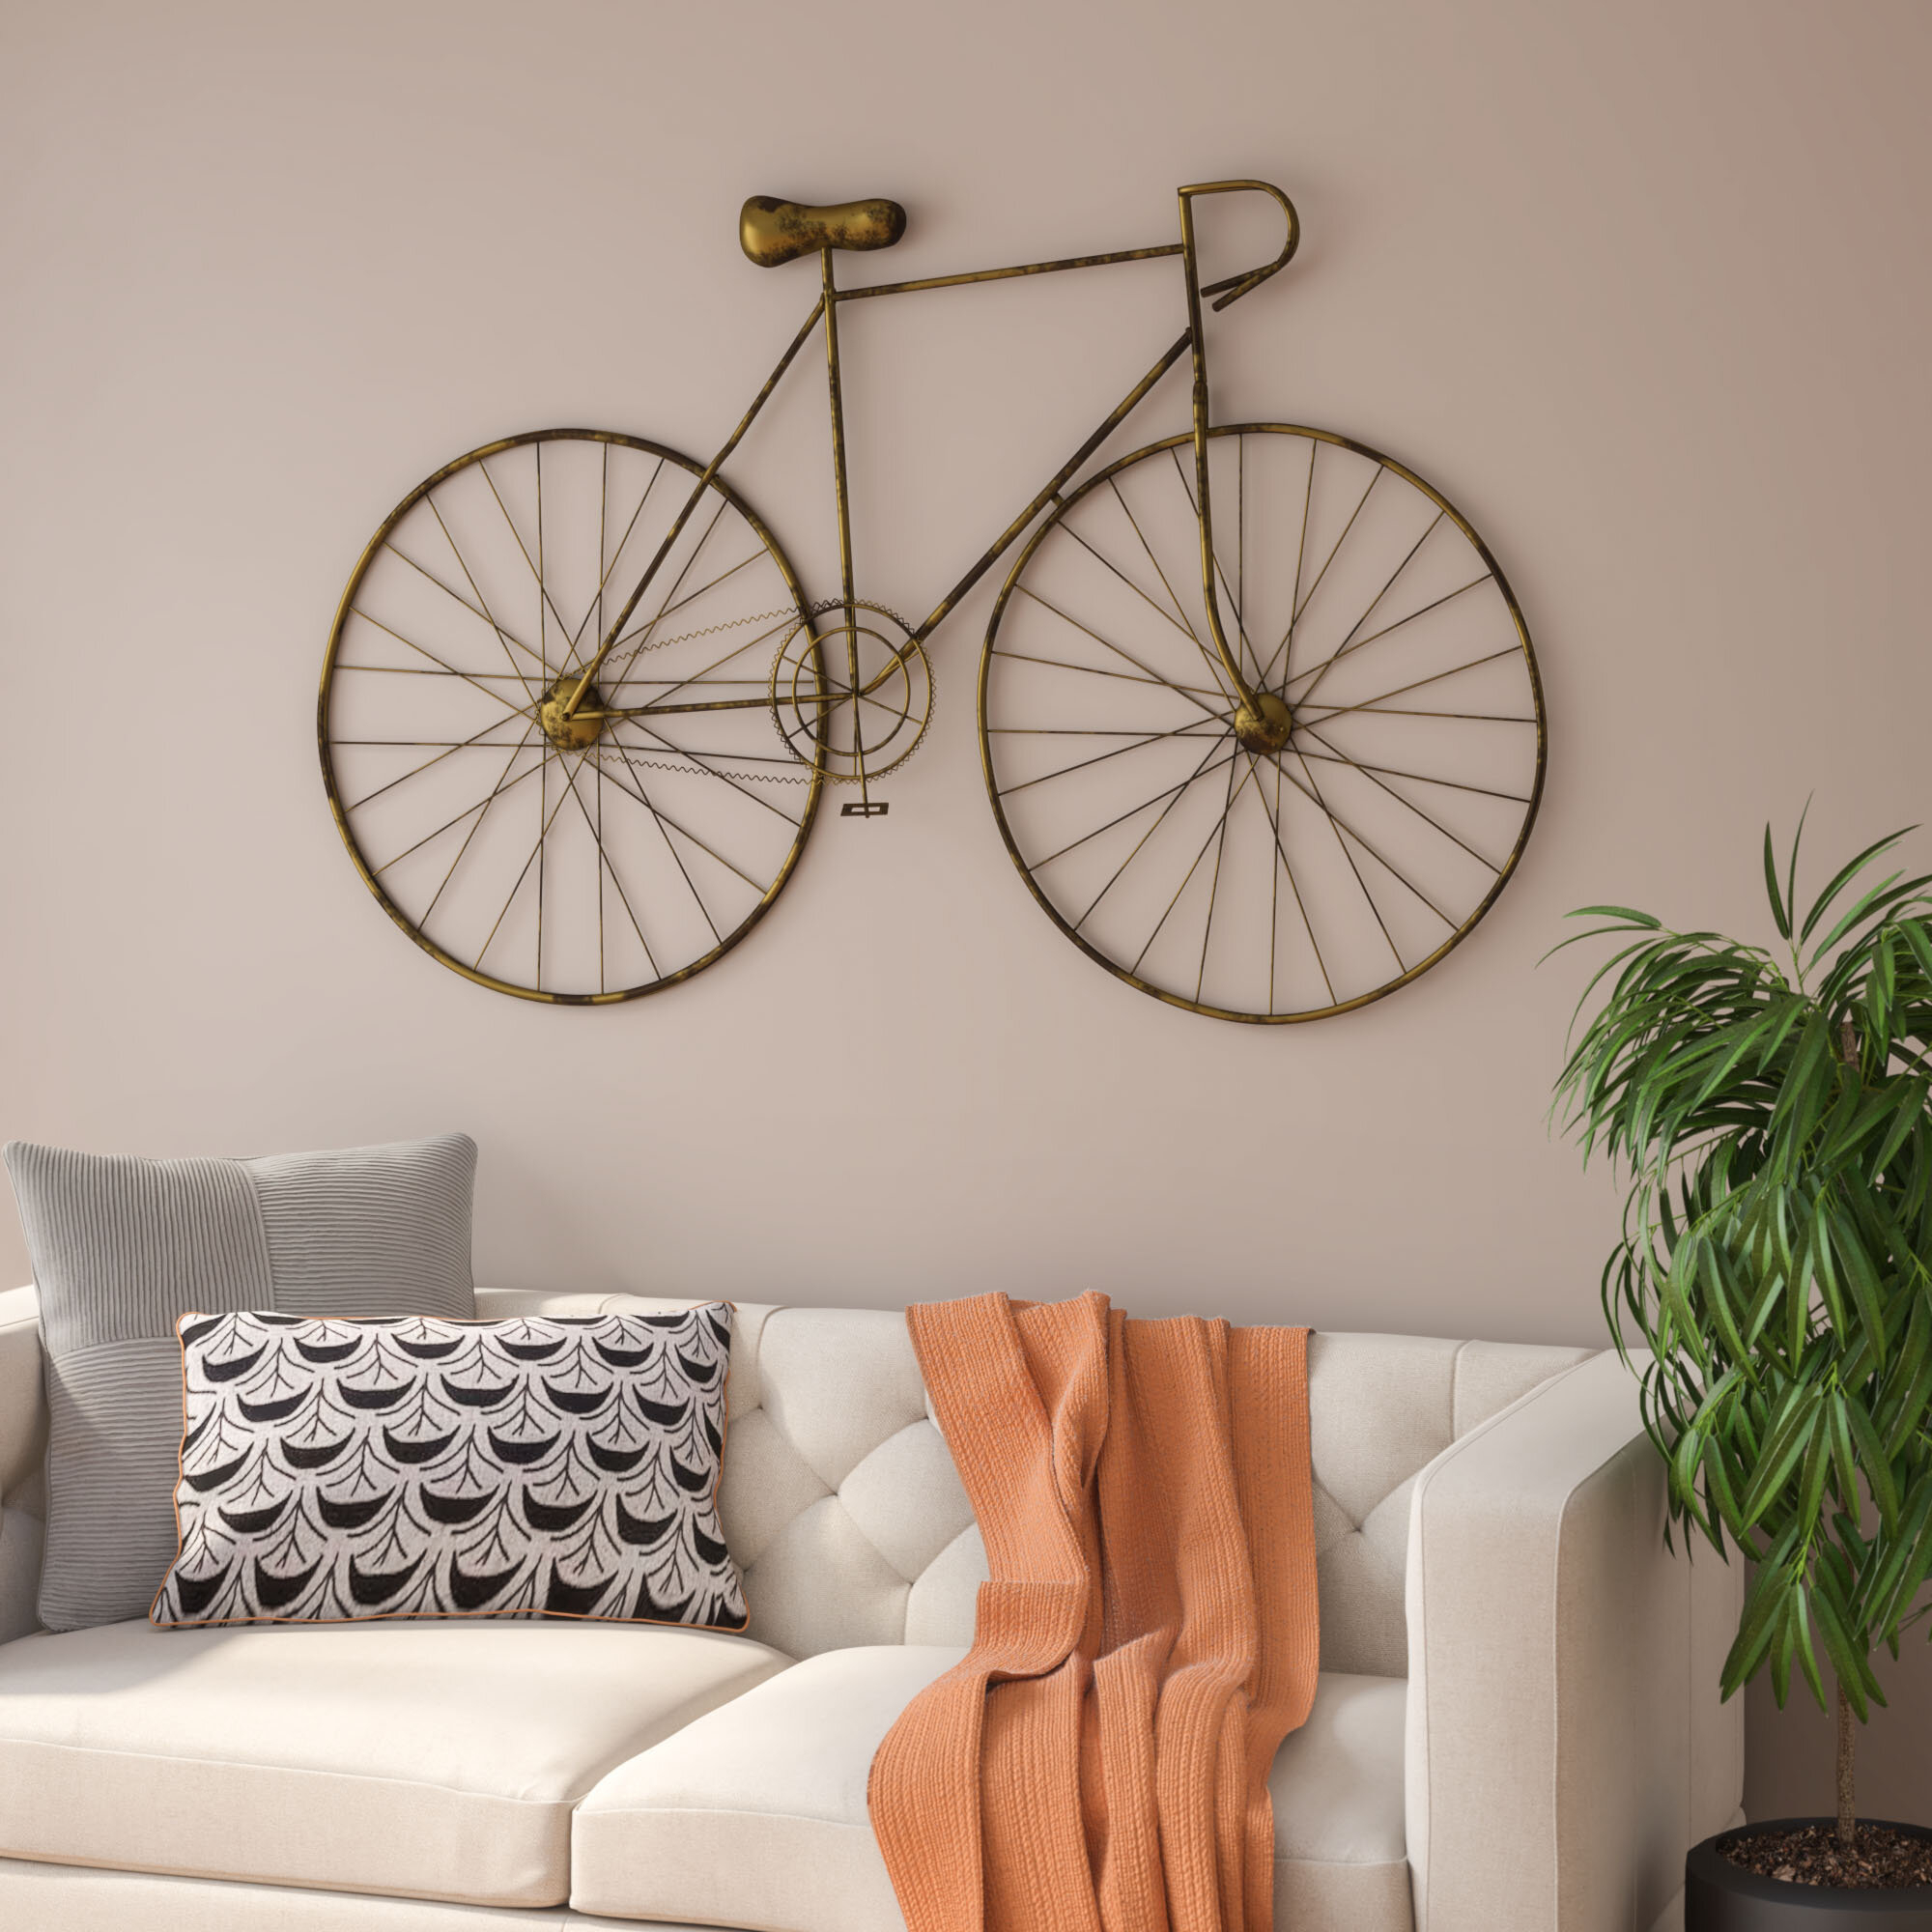 Wayfair Regarding Bike Wall Decor By August Grove (View 18 of 20)